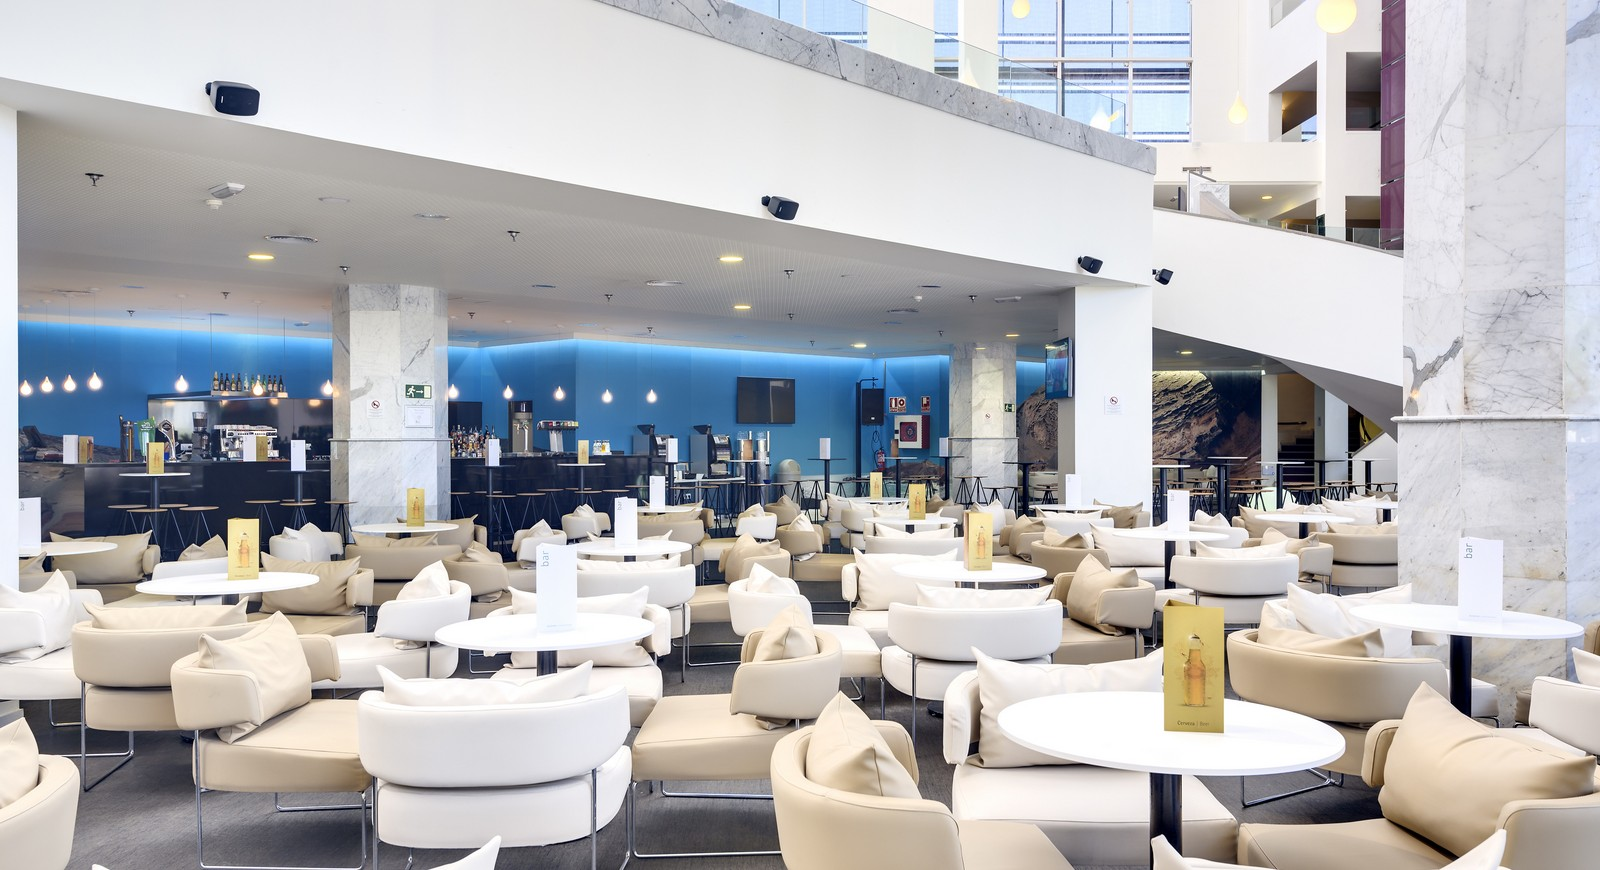 398-restaurant-43-hotel-occidental-lanzarote-playa_tcm7-118590_w1600_h870_n